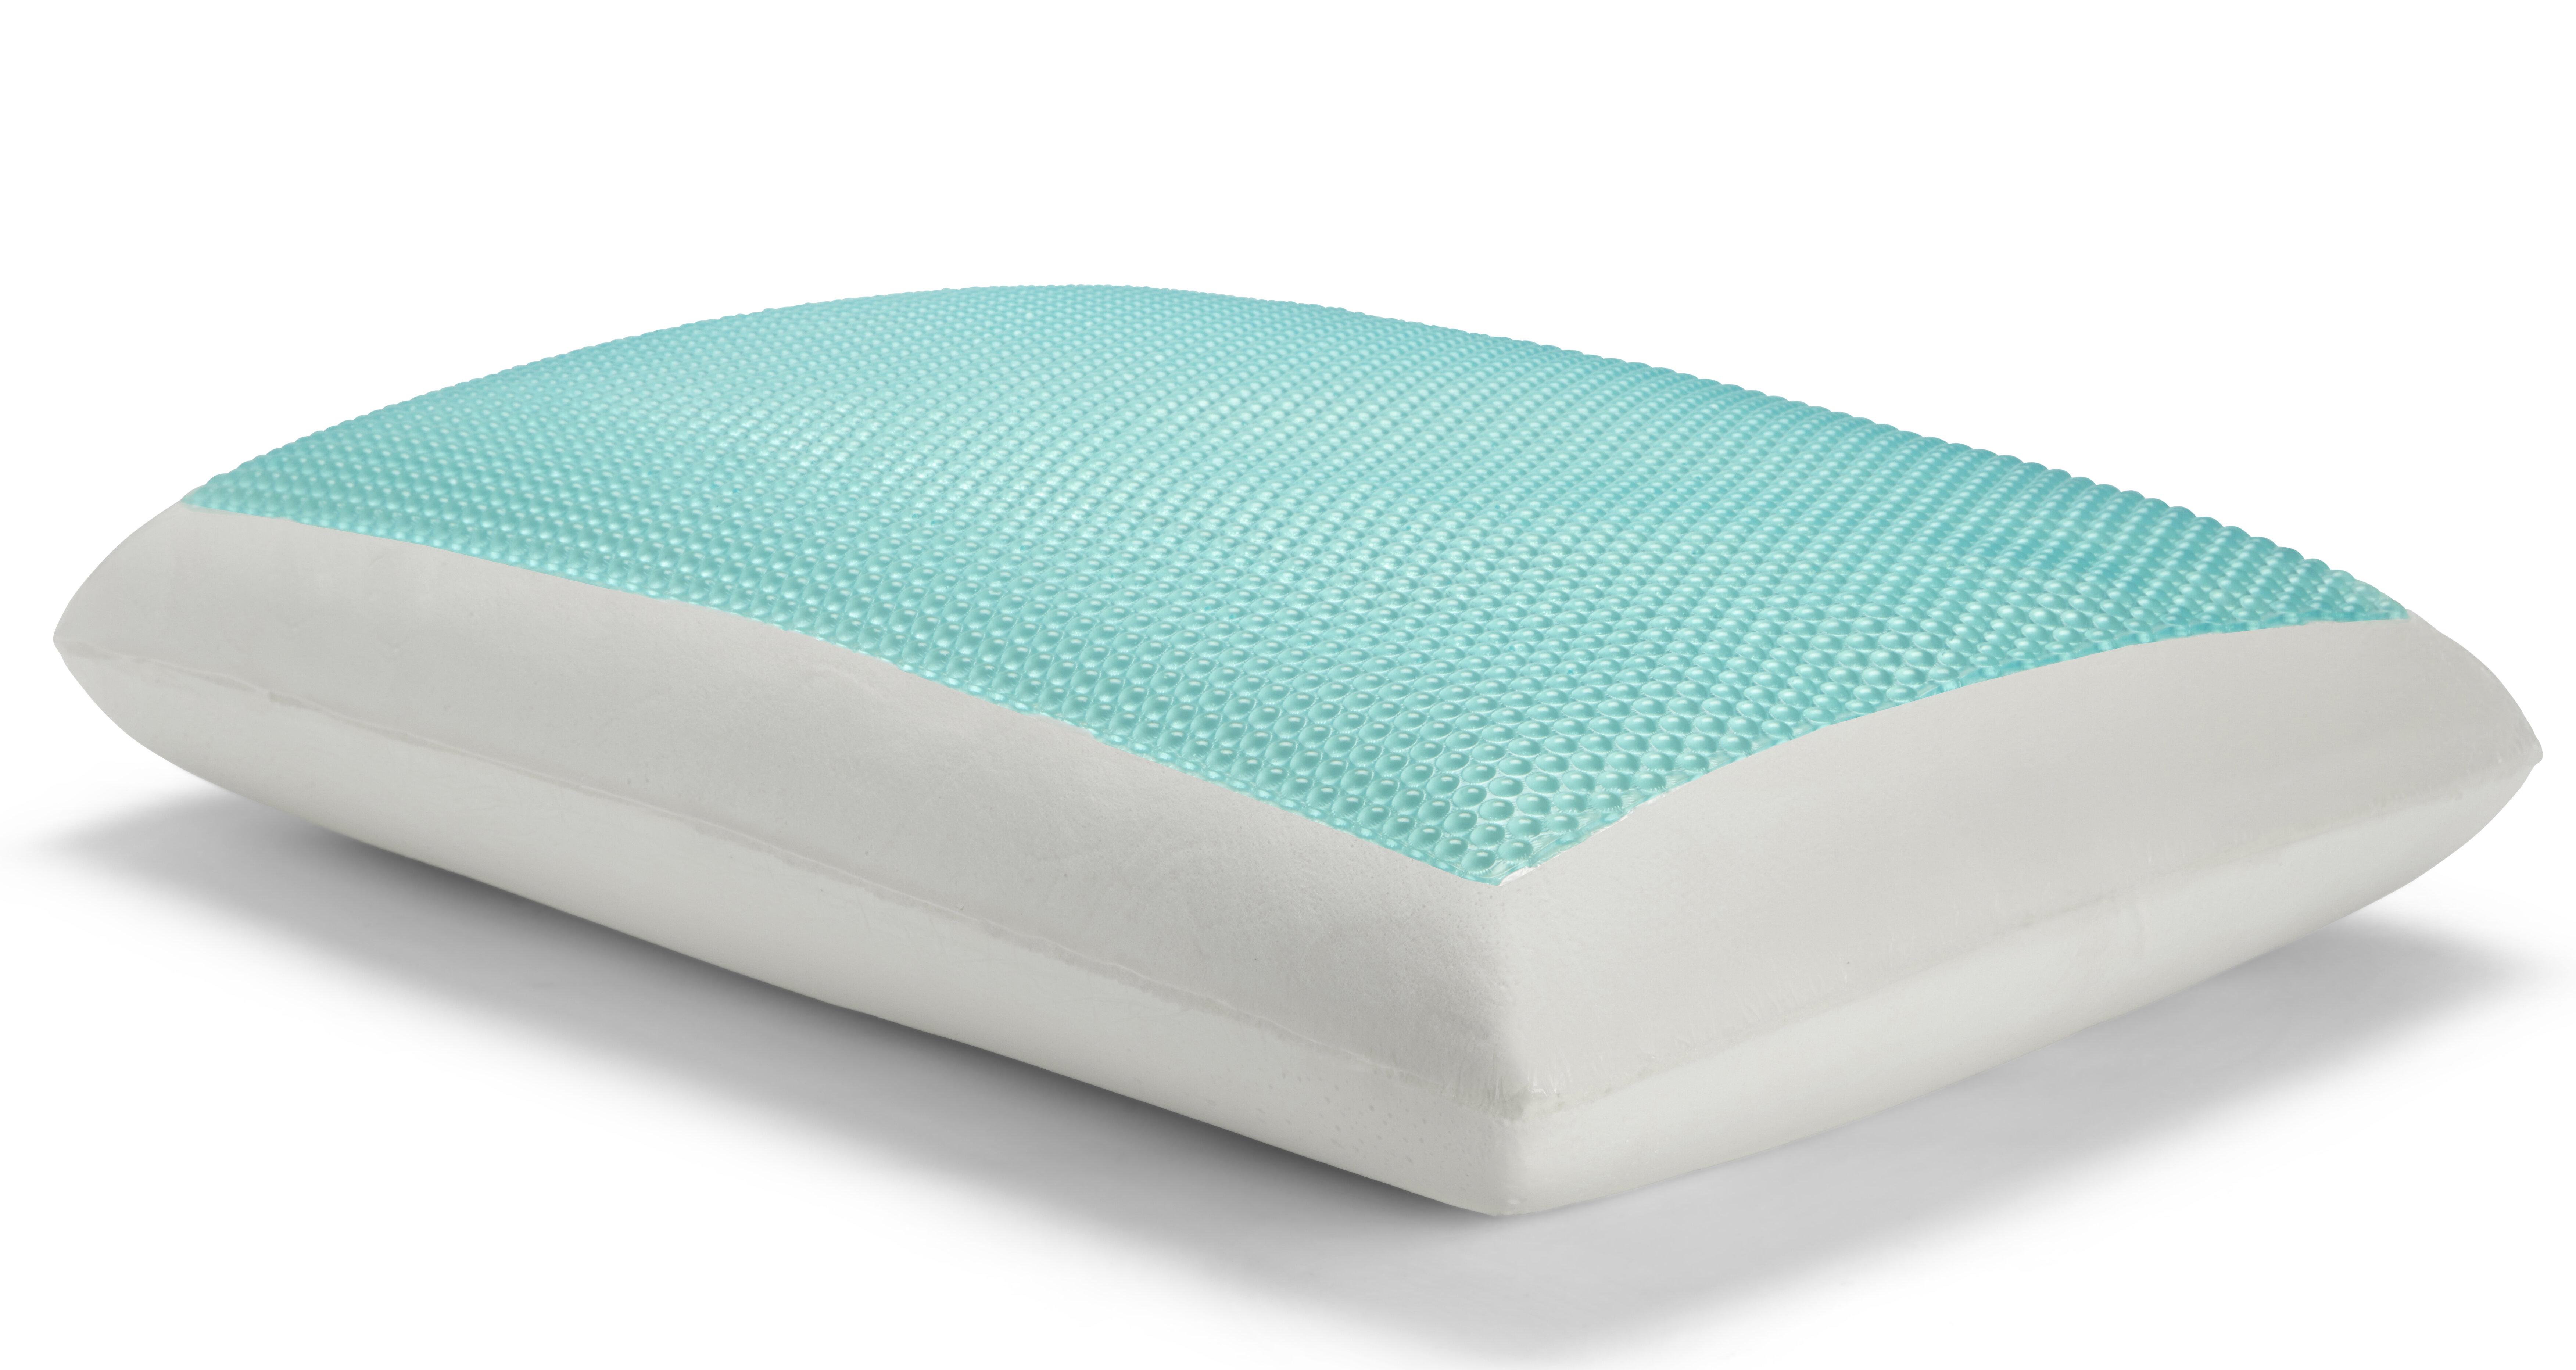 Sealy Gel Memory Foam Medium Cooling Support Bed Pillow Reviews Wayfair